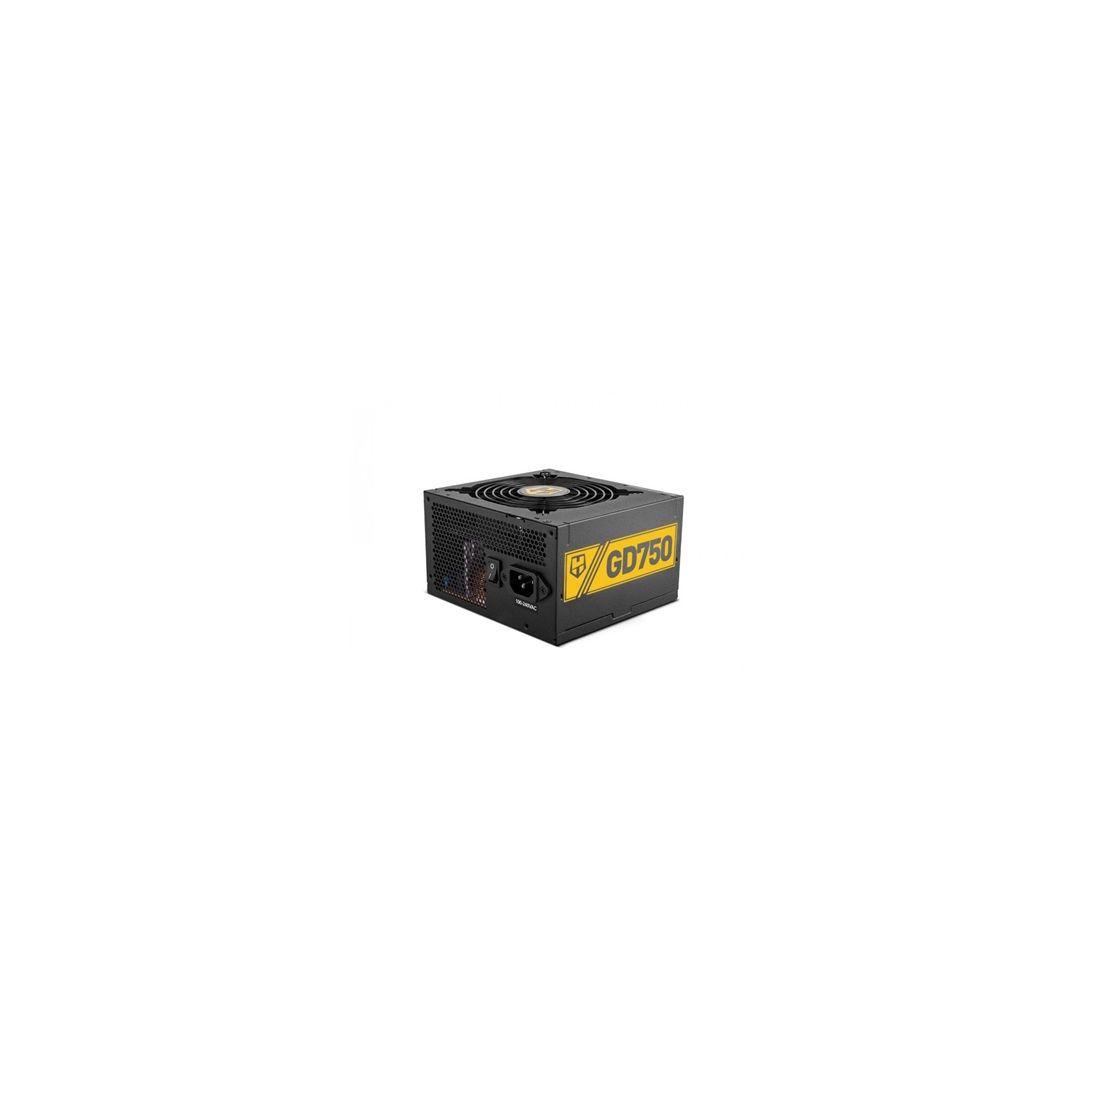 Nox Fuente Alimentacion Hummer GD750 80plus GOLD